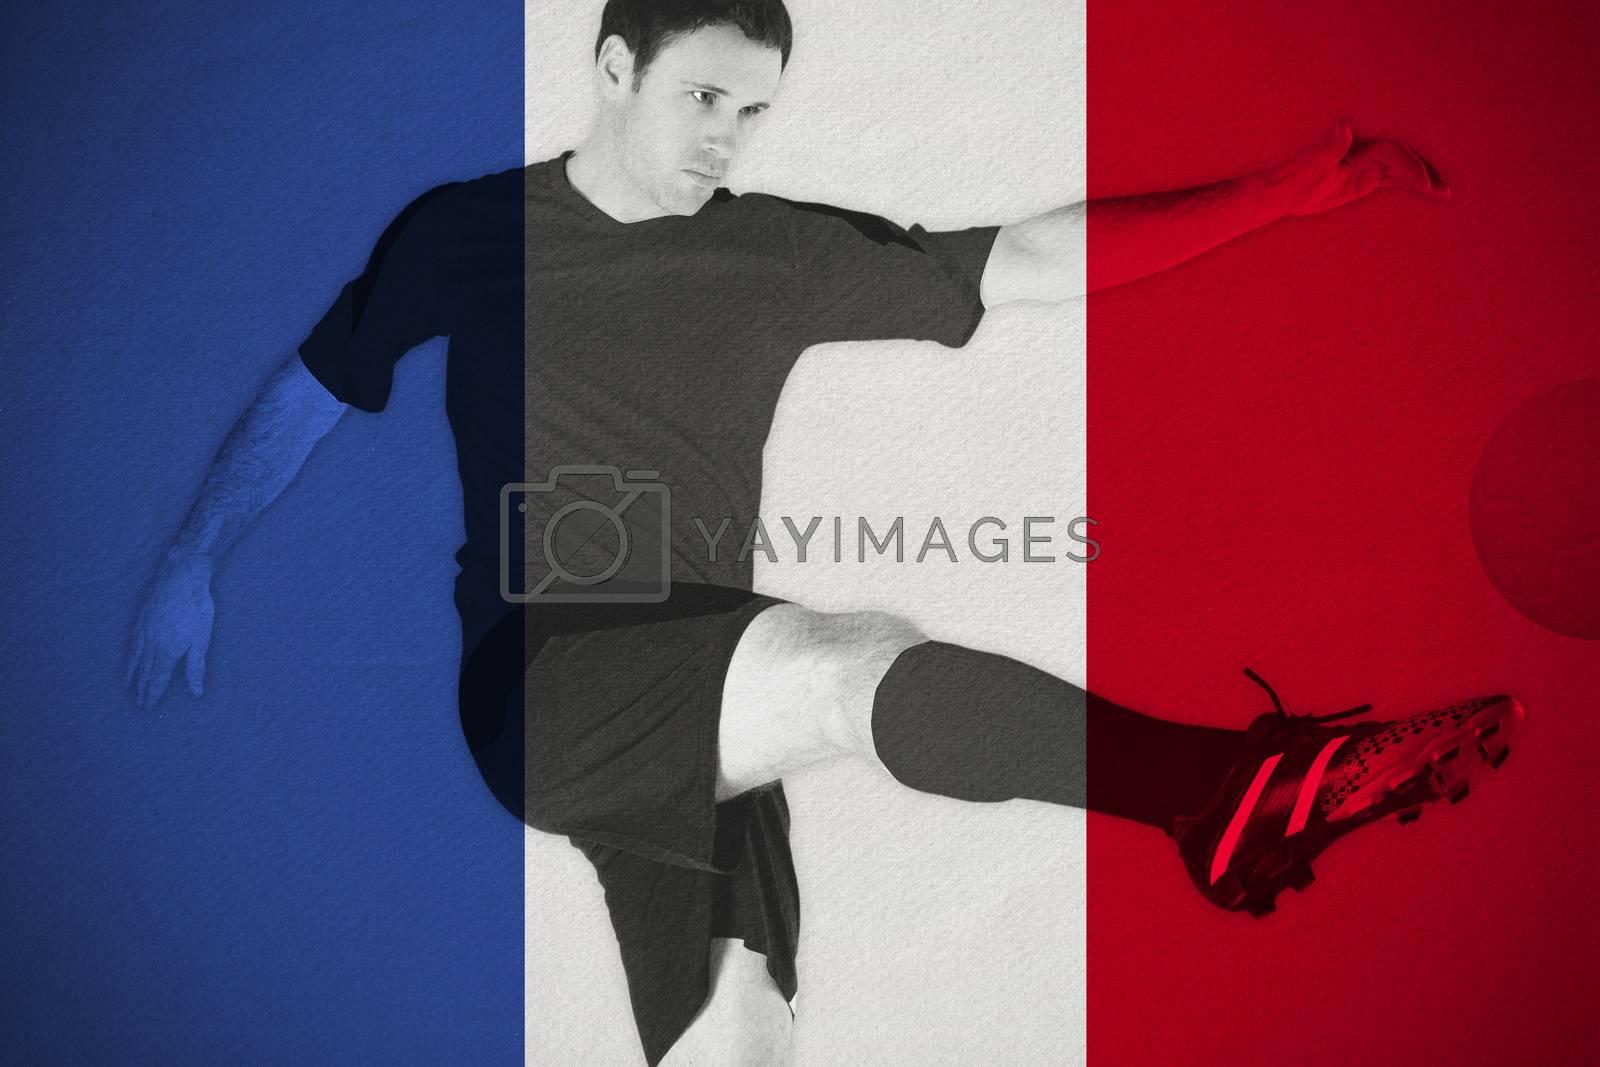 Football player in white kicking by Wavebreakmedia